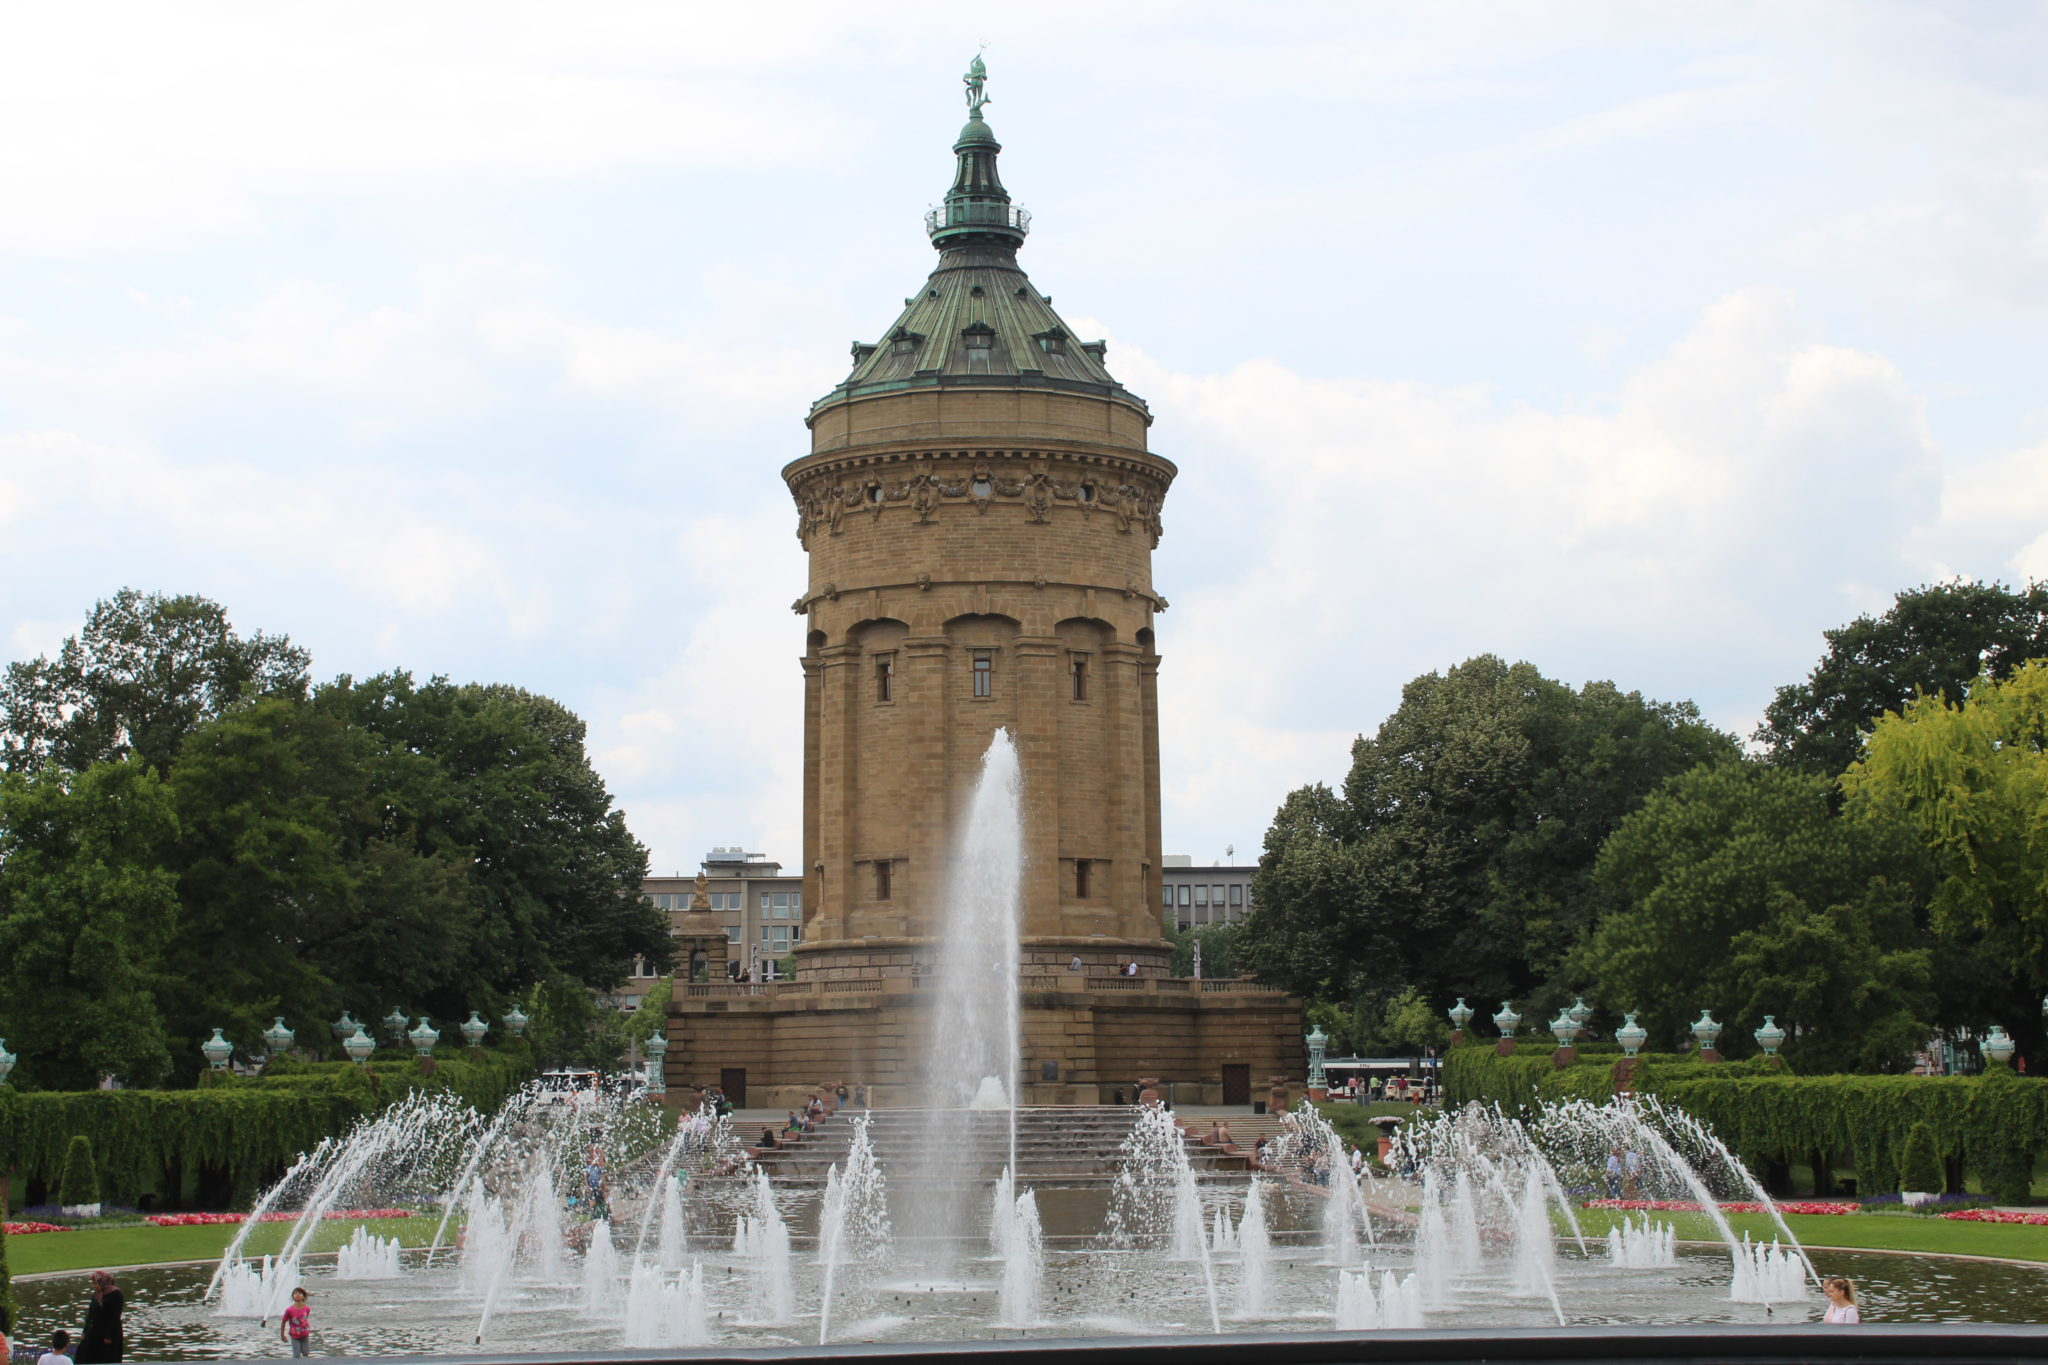 In Mannheim